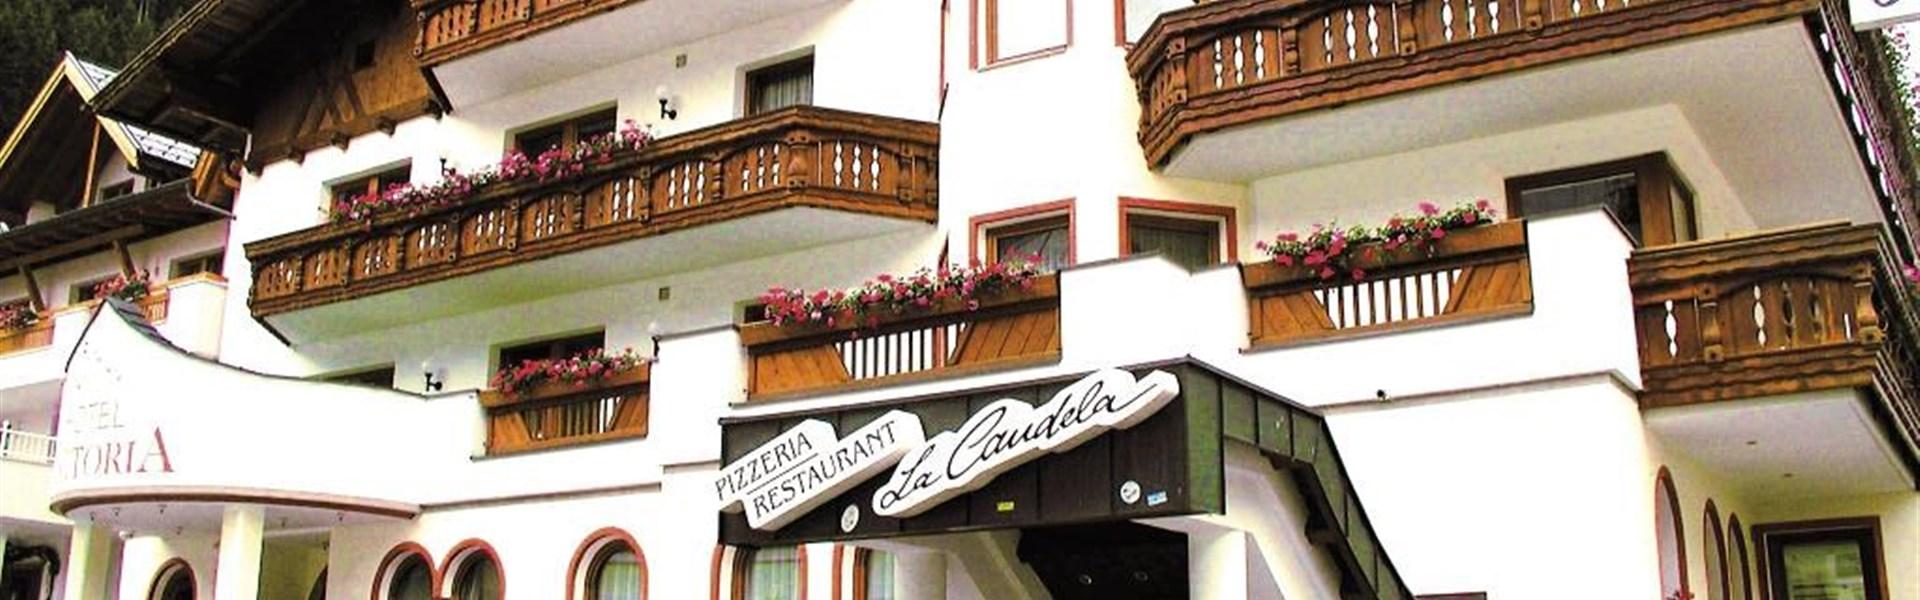 Ferienhotel Victoria -